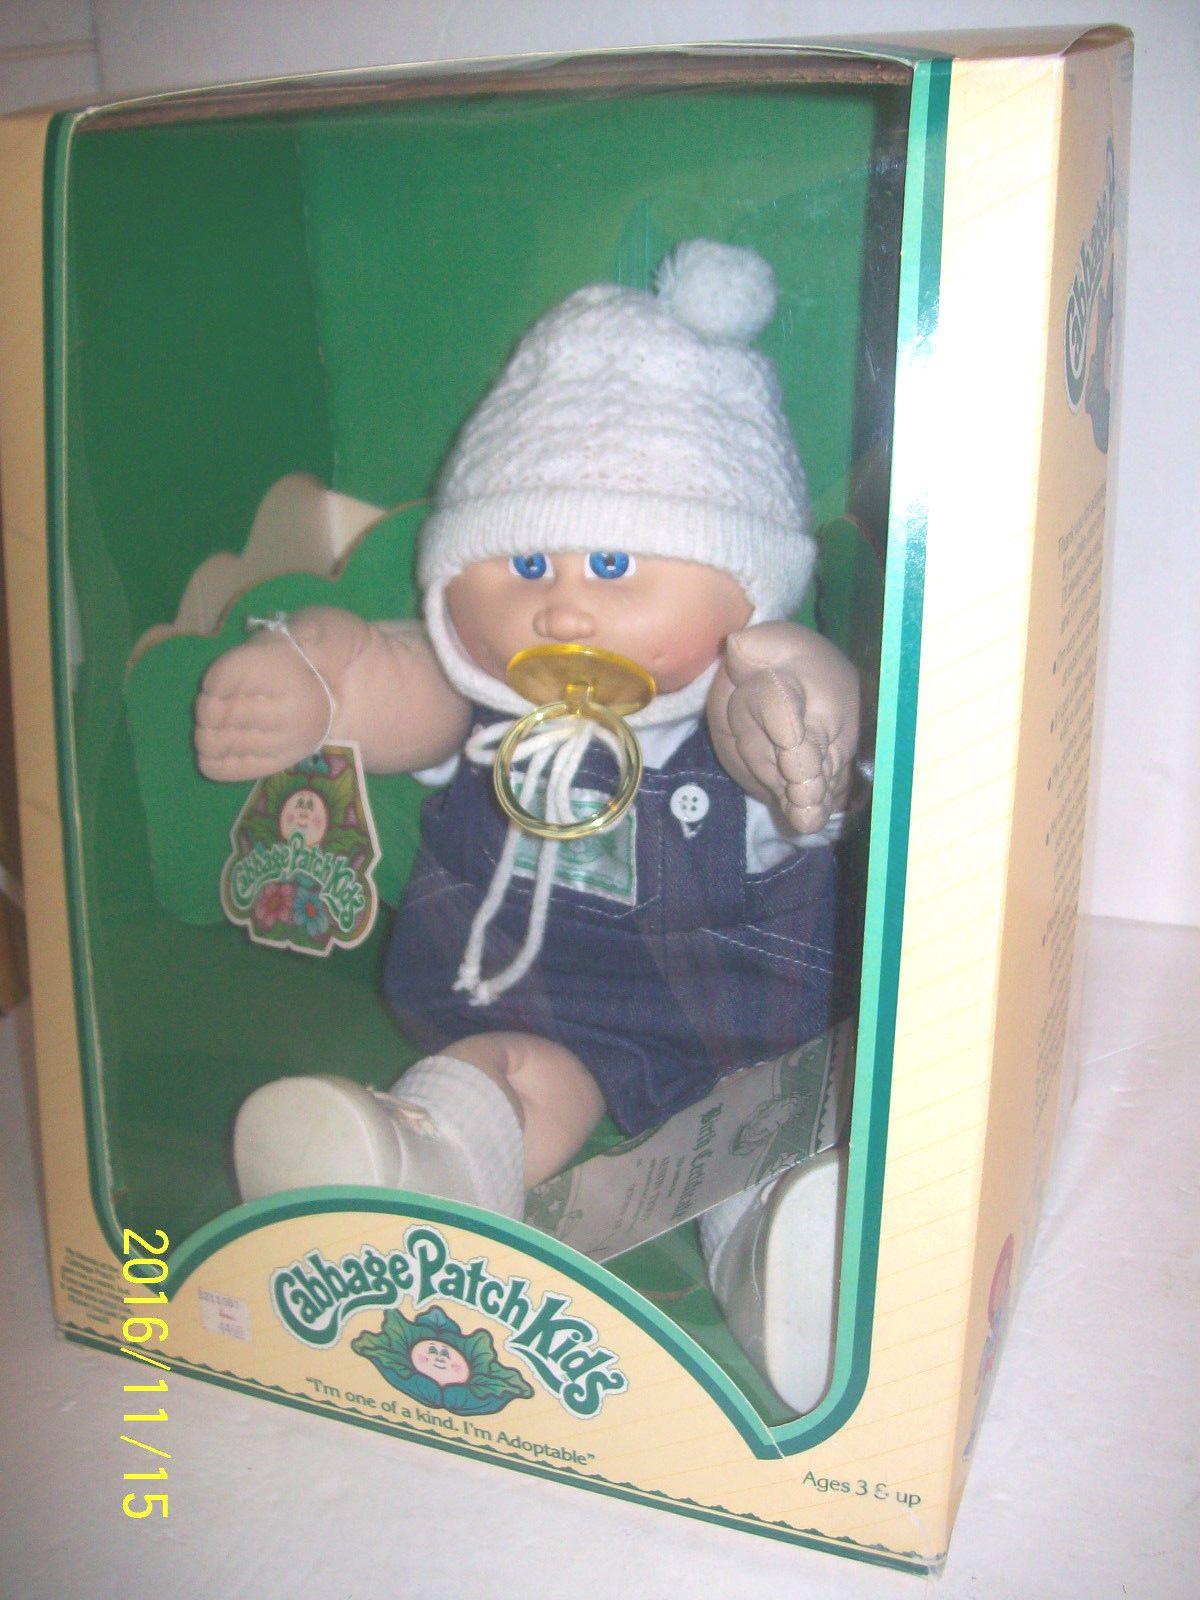 Vintage 1983 Cabbage Patch Kids Boy Preemie Doll Pacifier Hat Papers In Box Cabbage Patch Kids Boy Cabbage Patch Kids Cabbage Patch